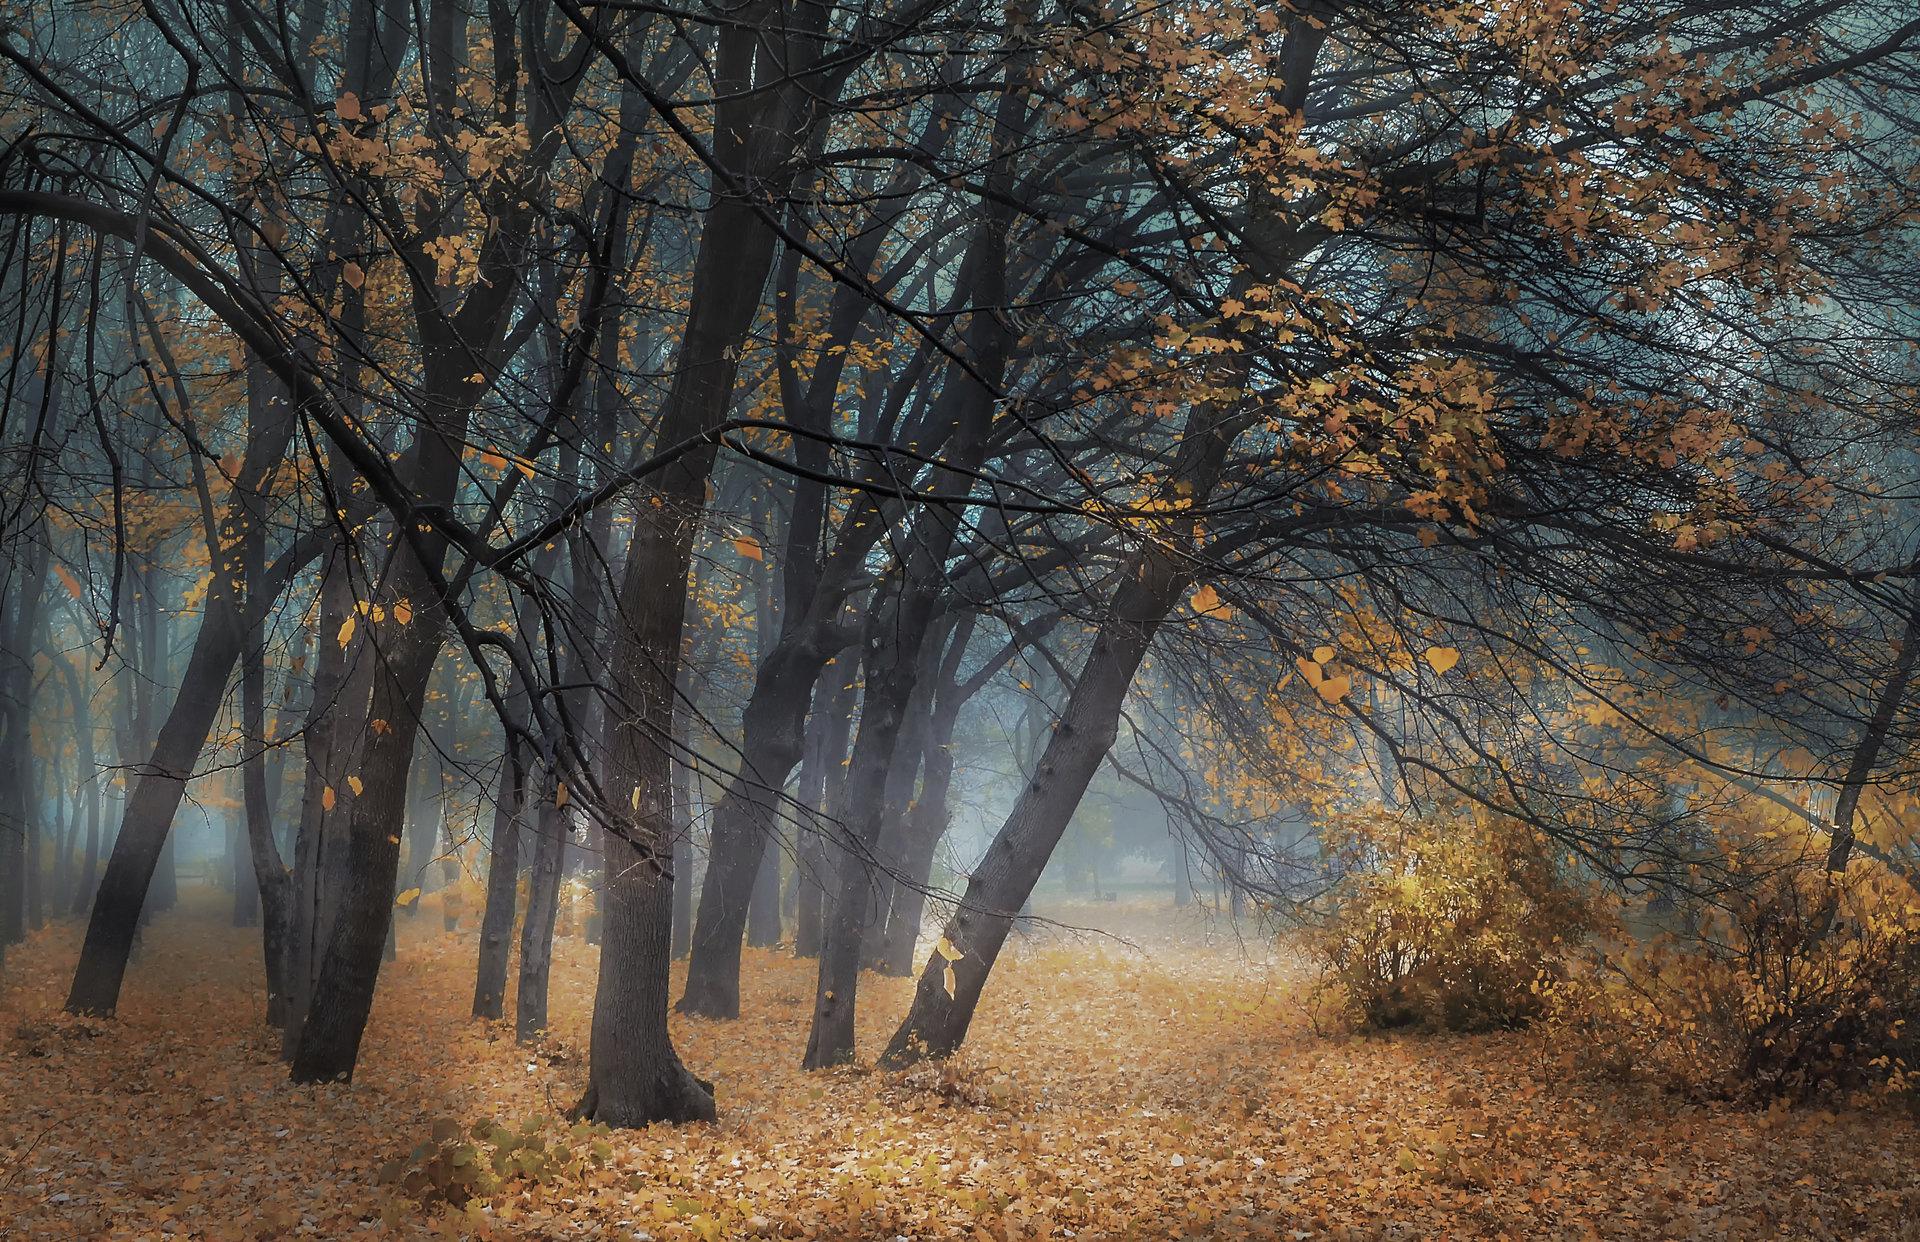 Photo in Landscape | Author mitakadobrev17 | PHOTO FORUM